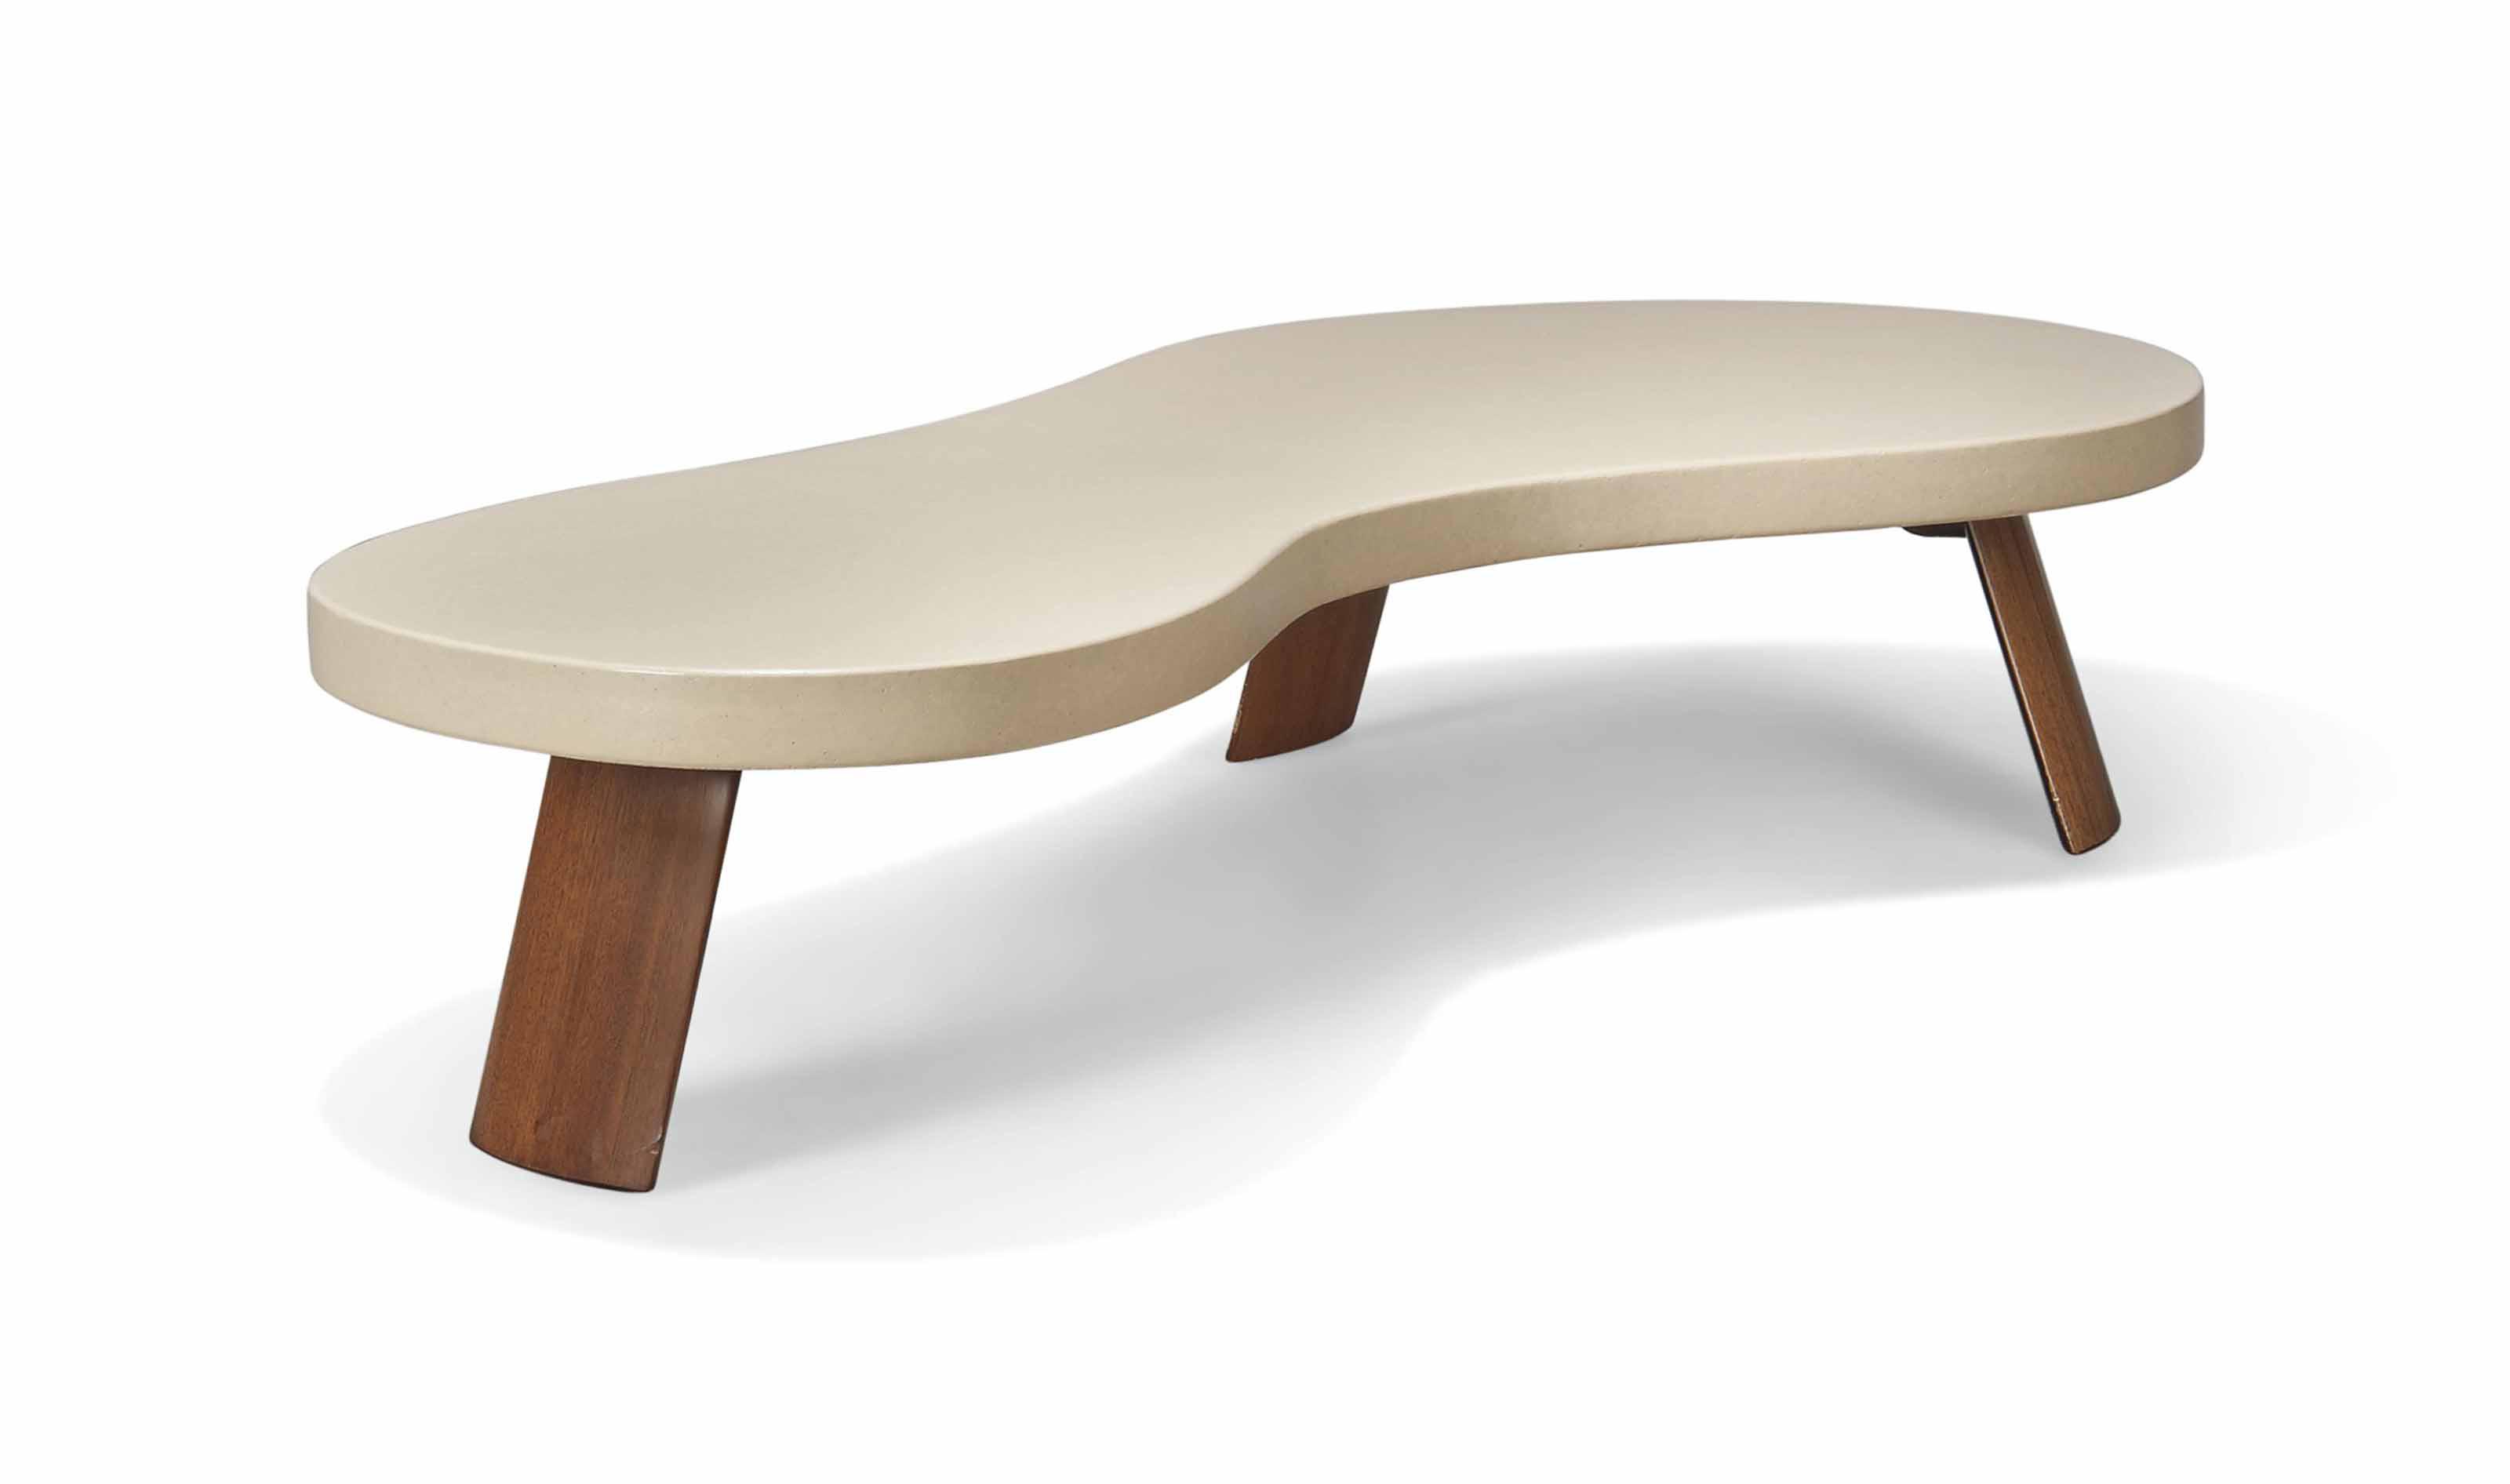 paul frankl 1886 1958 table basse 5028 vers 1950 dition johnson furniture company christie 39 s. Black Bedroom Furniture Sets. Home Design Ideas